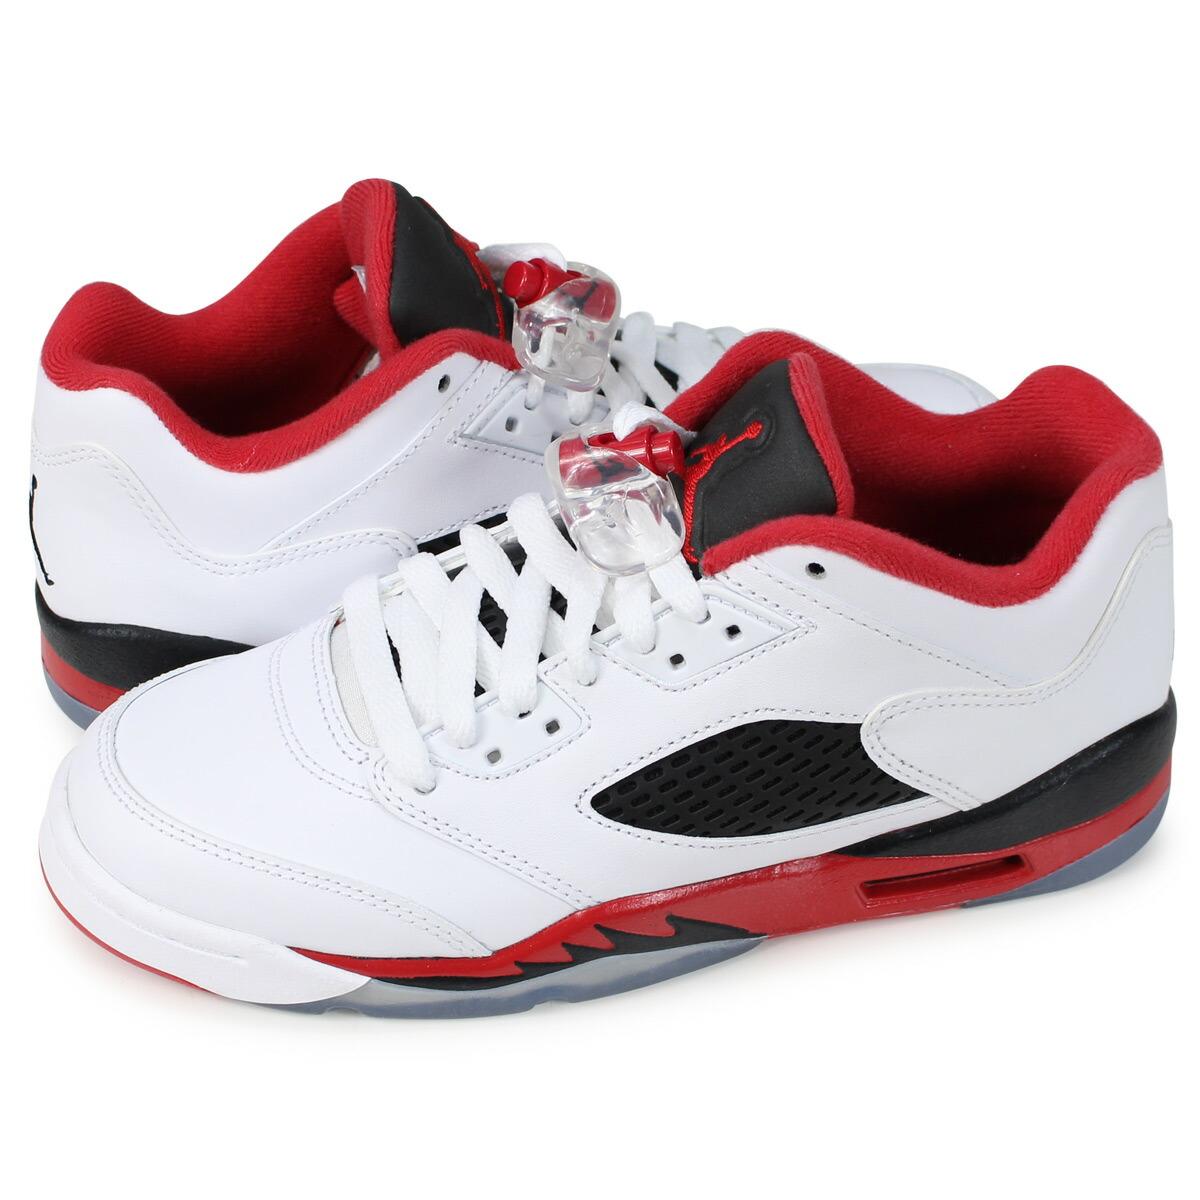 f03ab53f7a9 Whats up Sports: Nike NIKE Air Jordan 5 nostalgic lady's sneakers ...